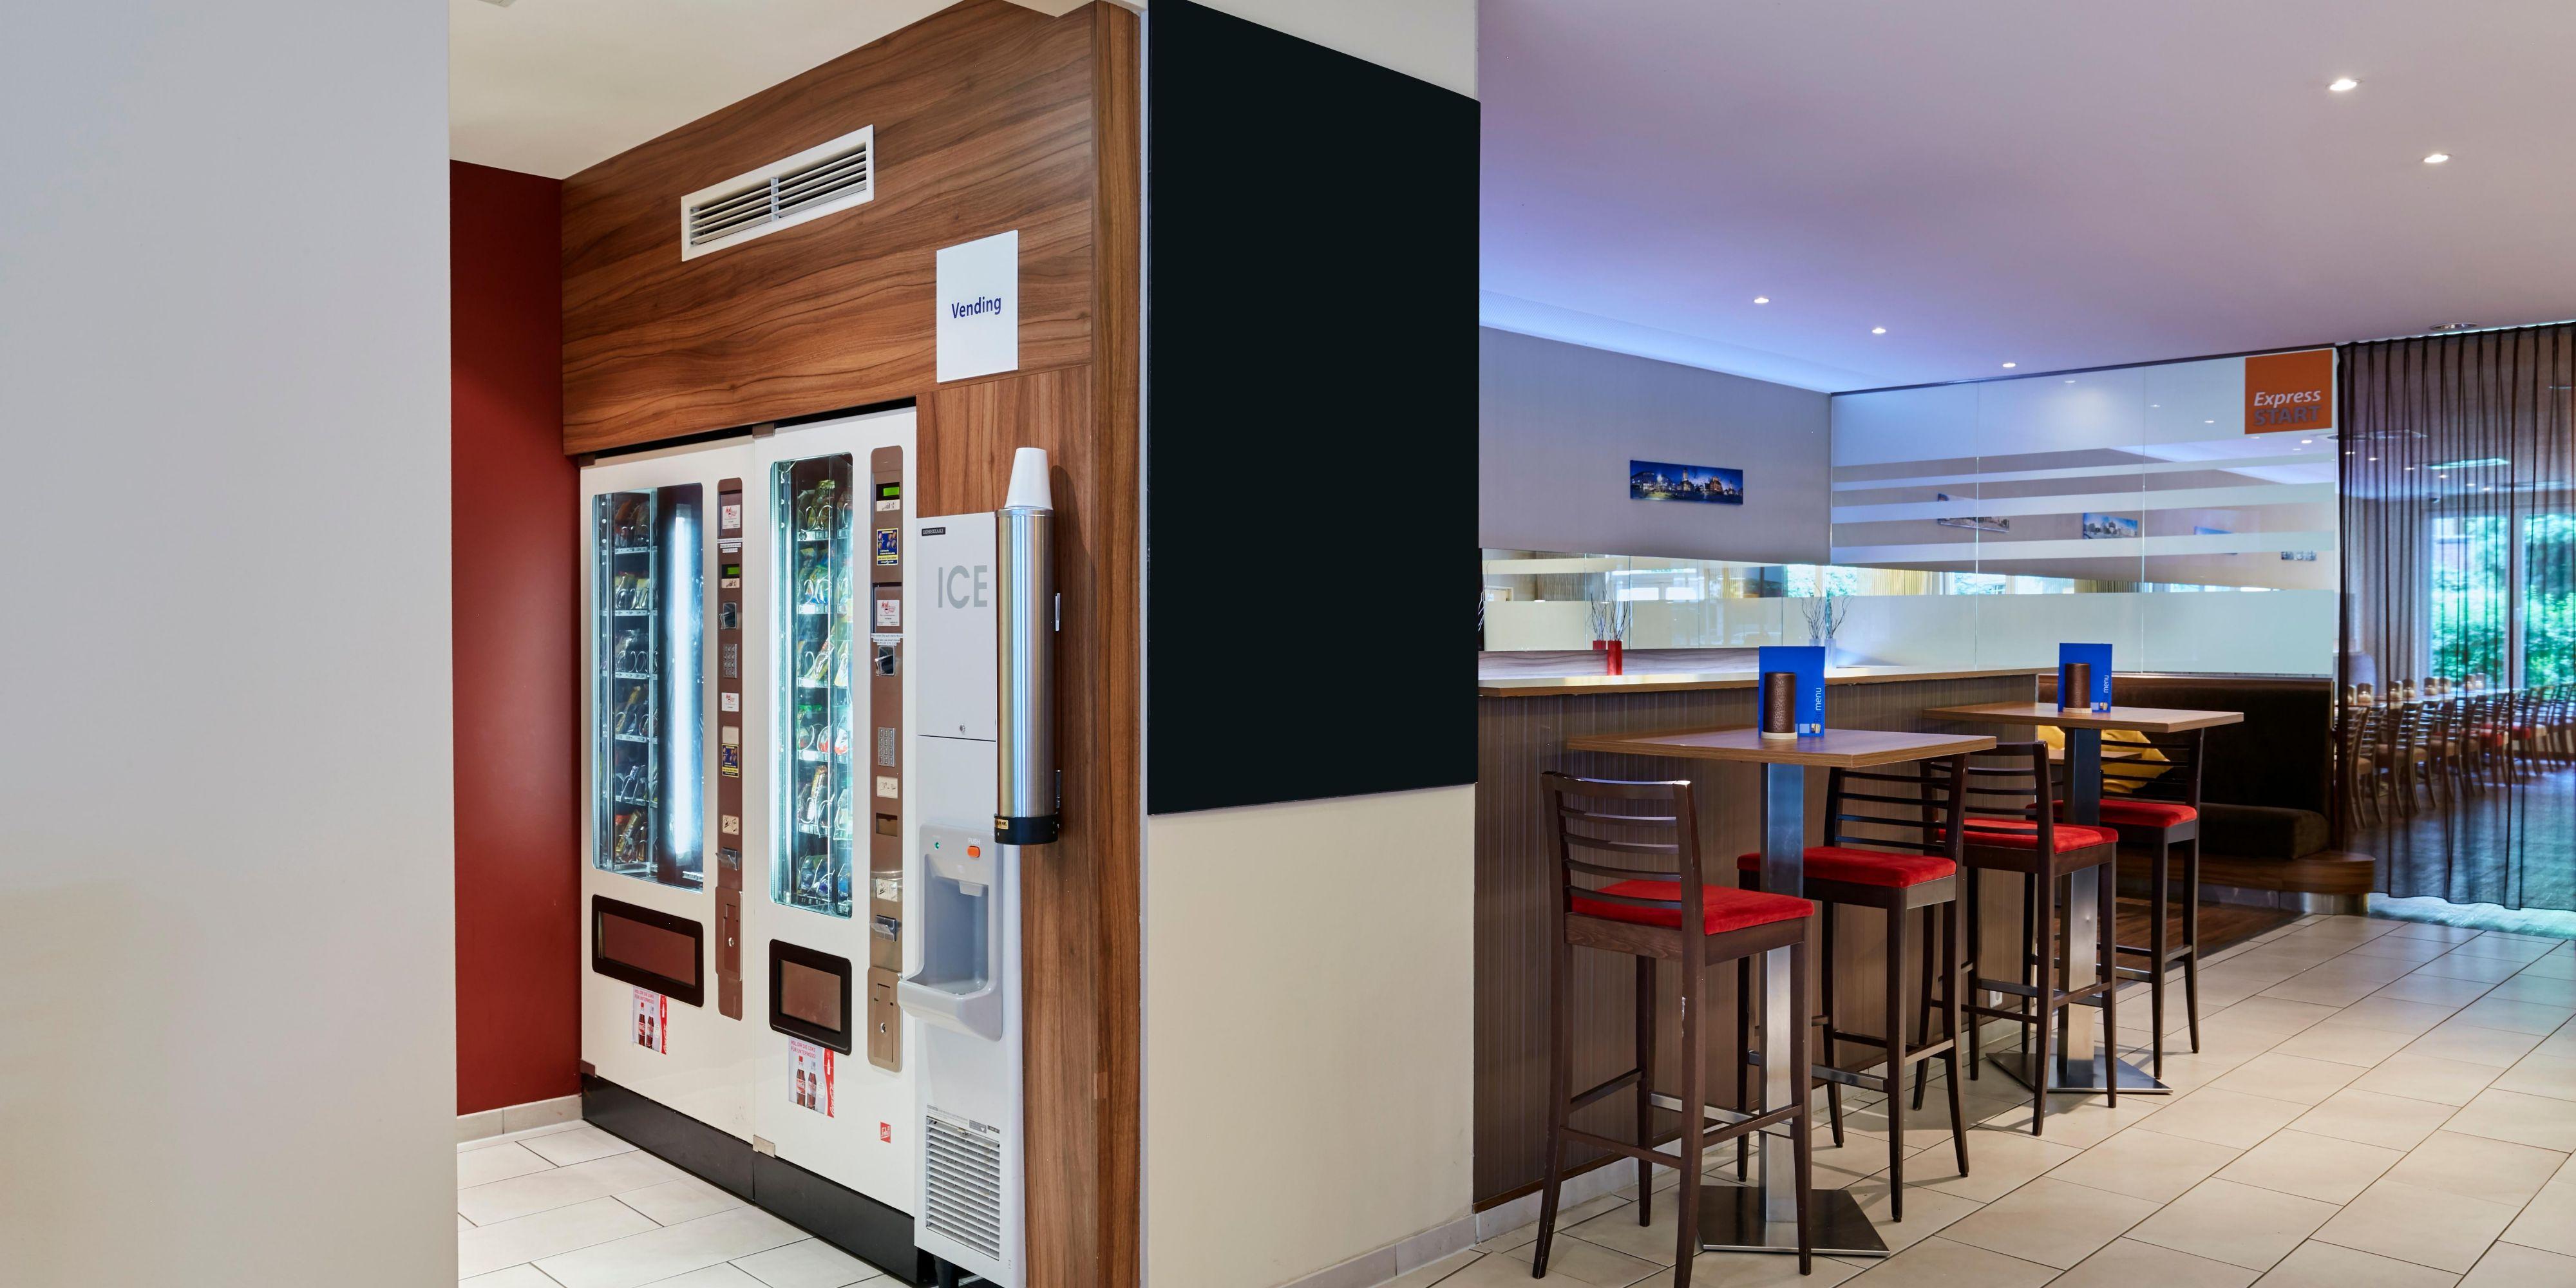 Holiday Inn Express Berlin City Centre-West Hotel by IHG